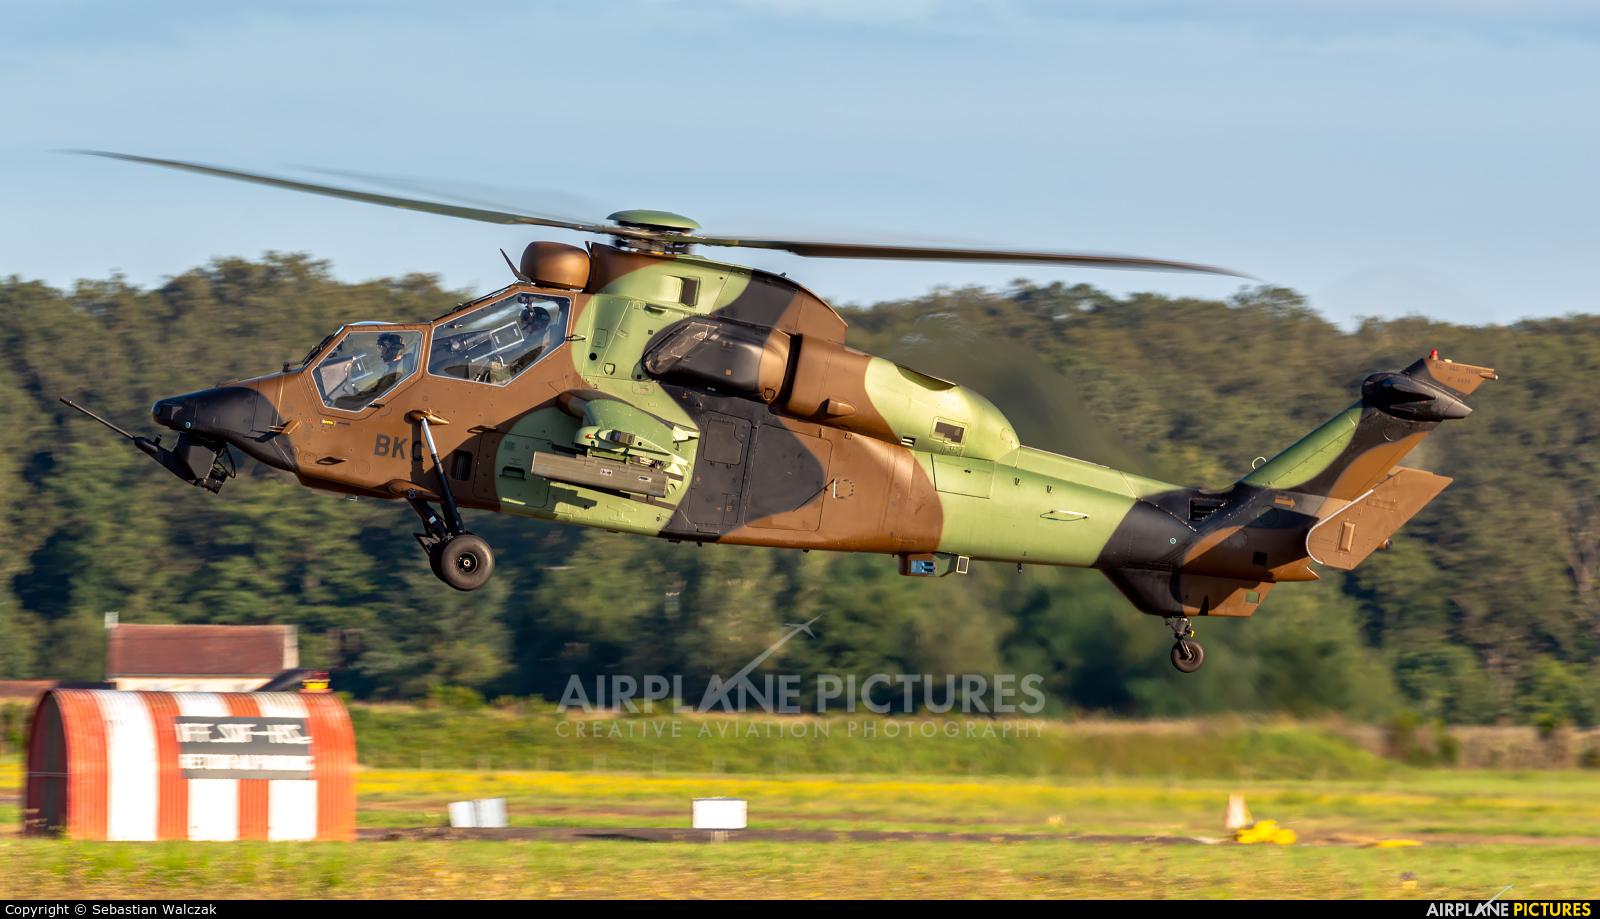 France - Army 6029 aircraft at Luxeuil-Saint-Sauveur AB